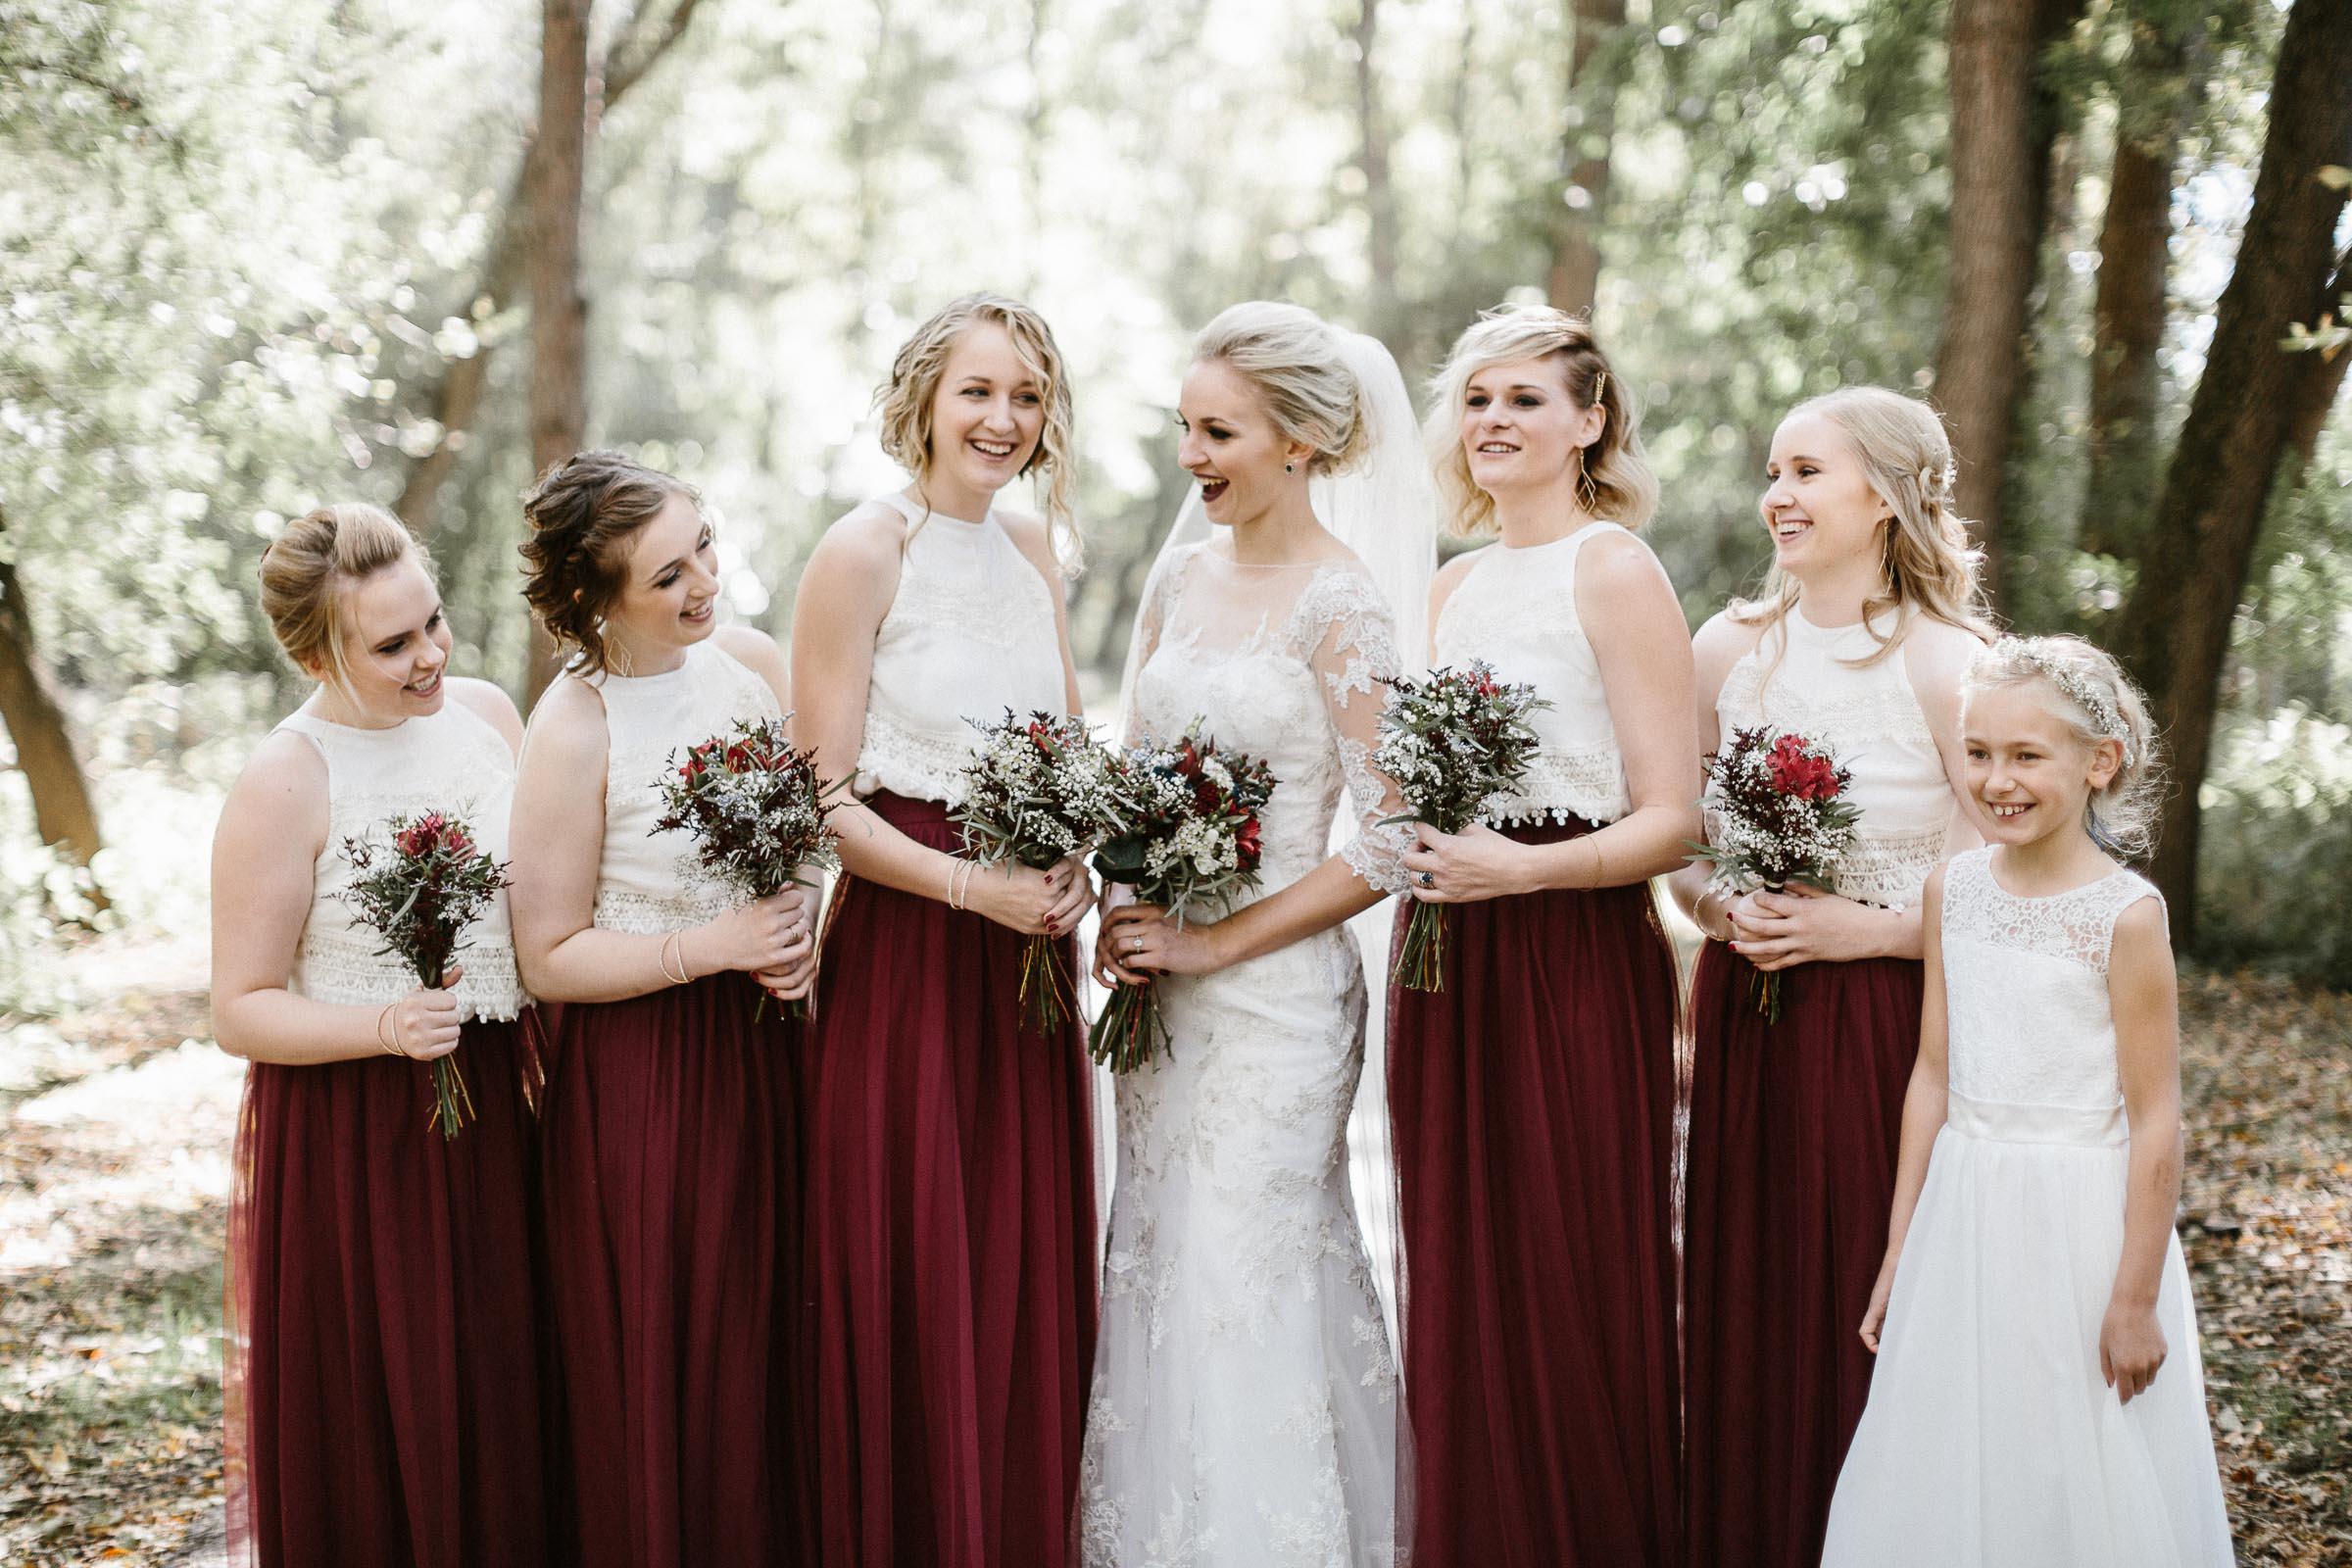 Jenna&Austin_SiouxFalls_Wedding_Photographer_061.jpg